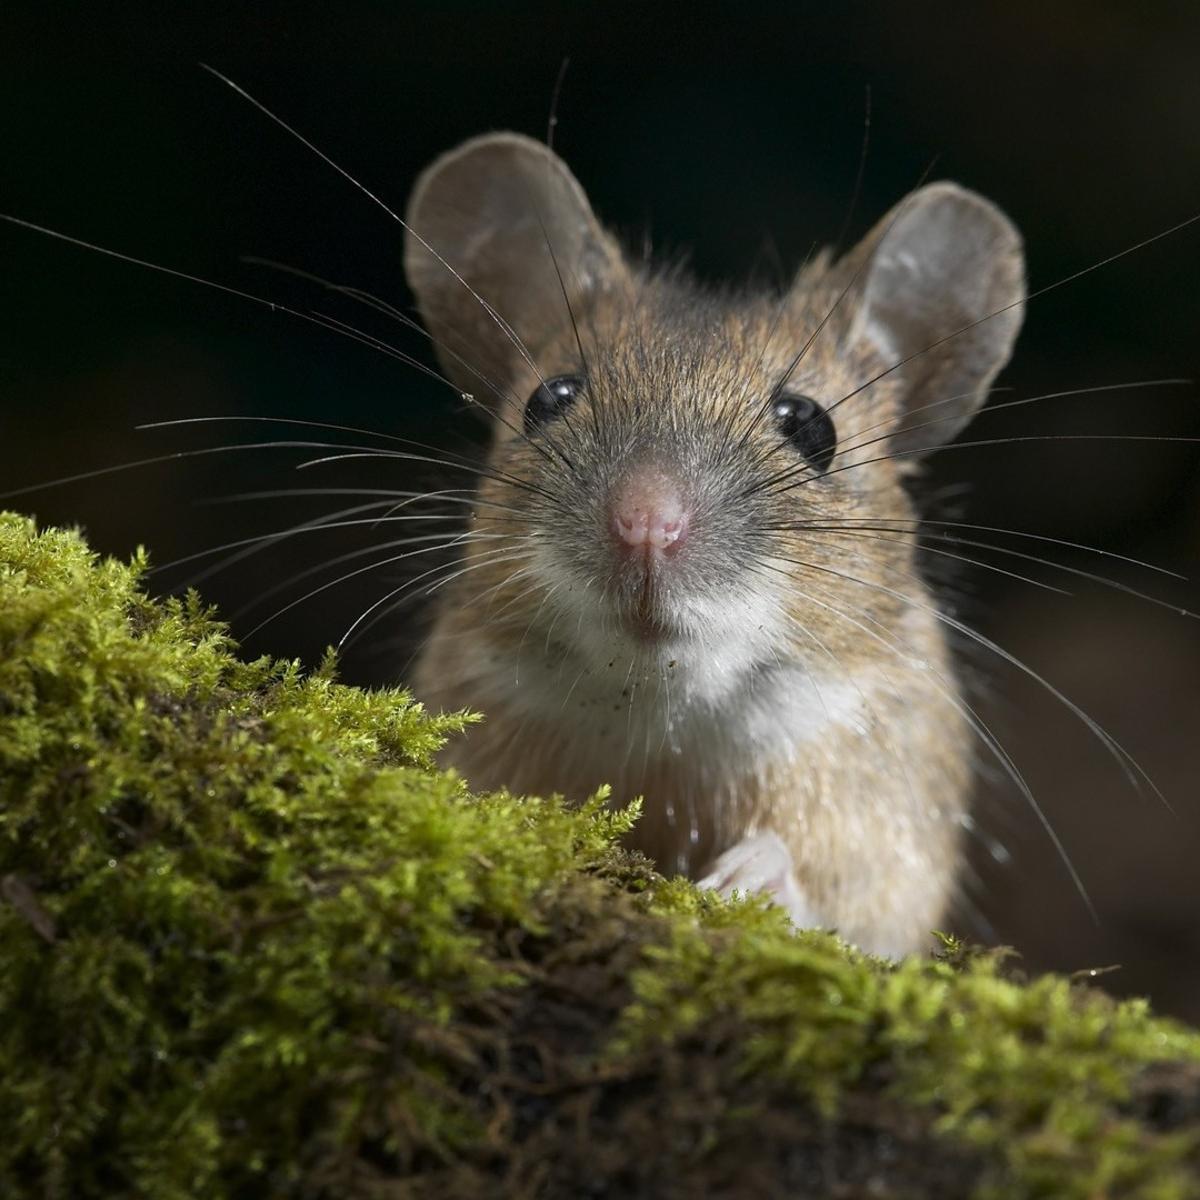 forest-mice-animals-nature-grass-wildlife-109260-wallhere.com (1).jpg